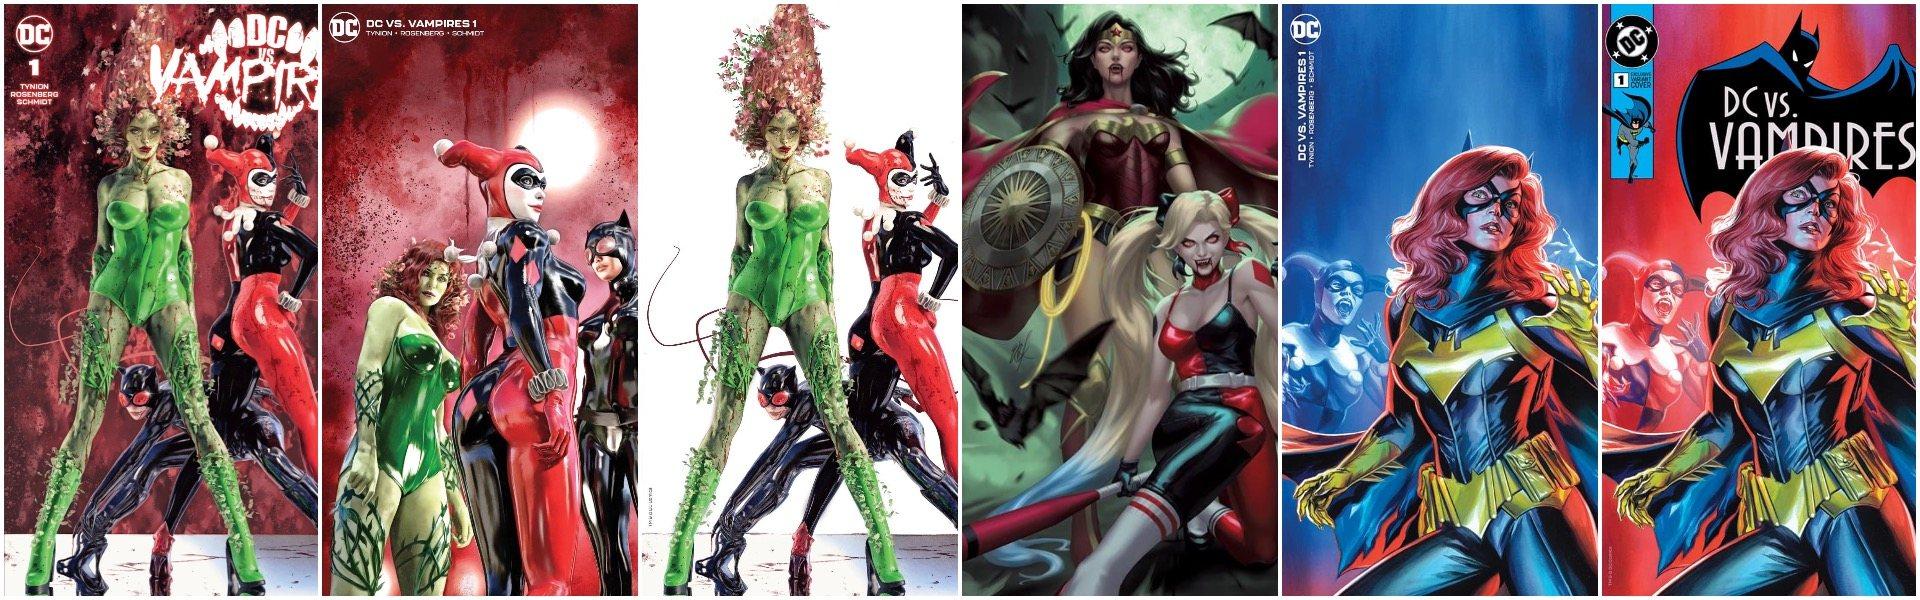 DC vs Vampires #1 Exclusives